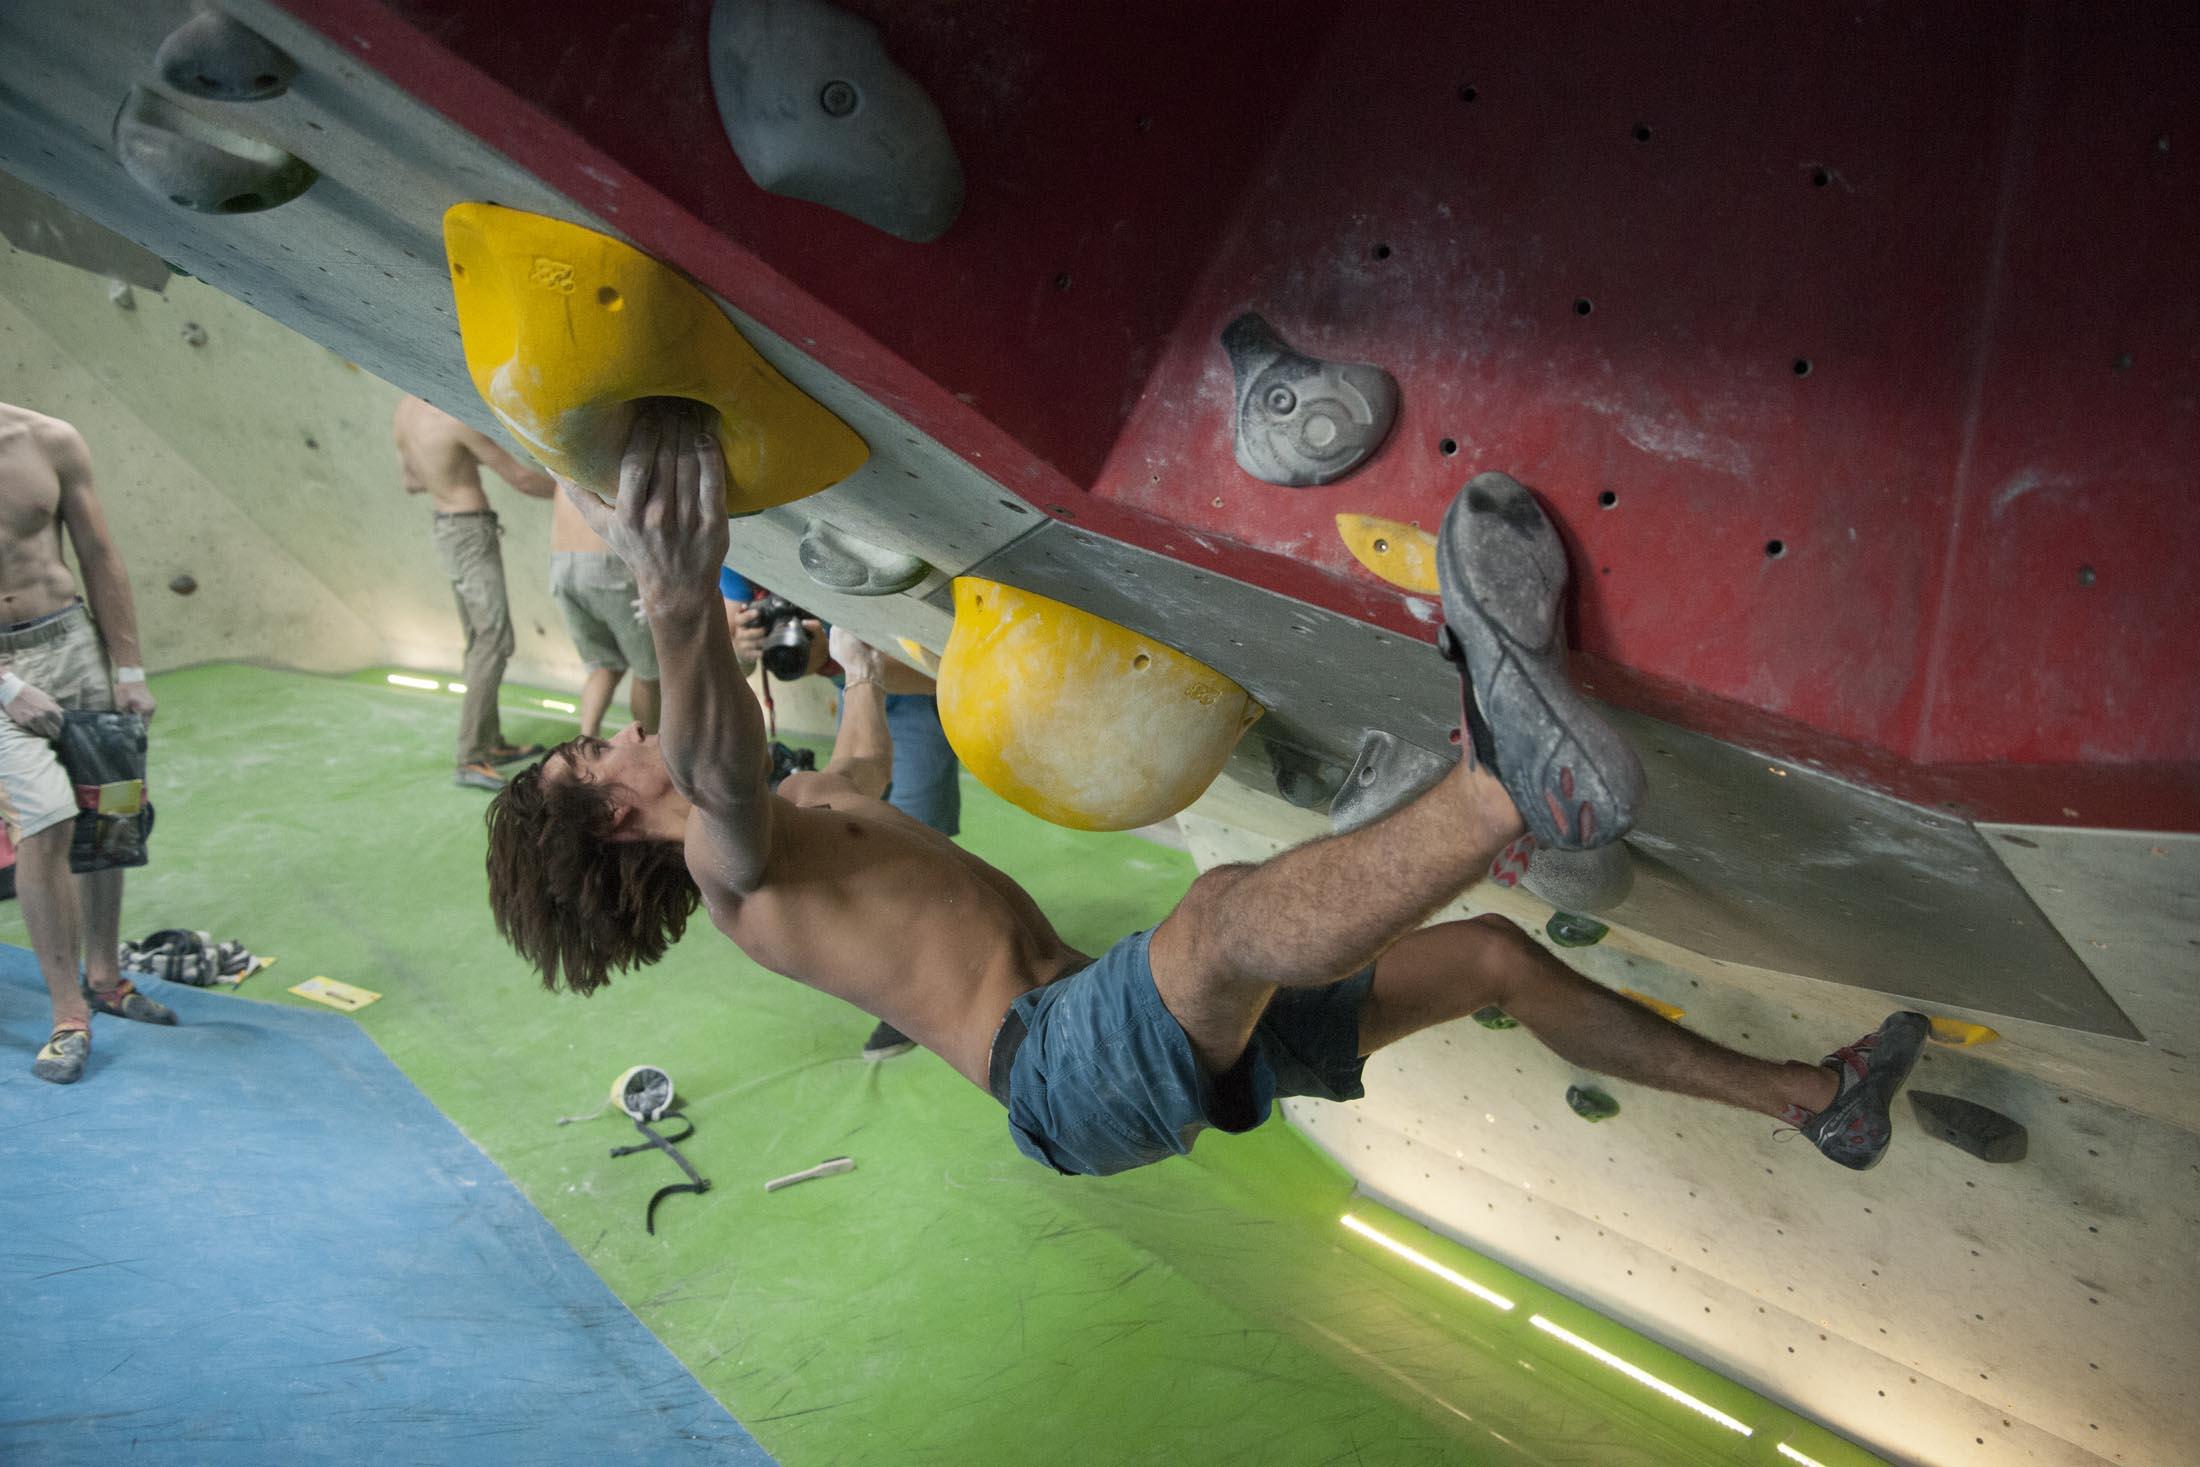 Quali, internationaler bouldercup Frankenjura 2016, BLOCKHELDEN Erlangen, Mammut, Bergfreunde.de, Boulderwettkampf07092016256